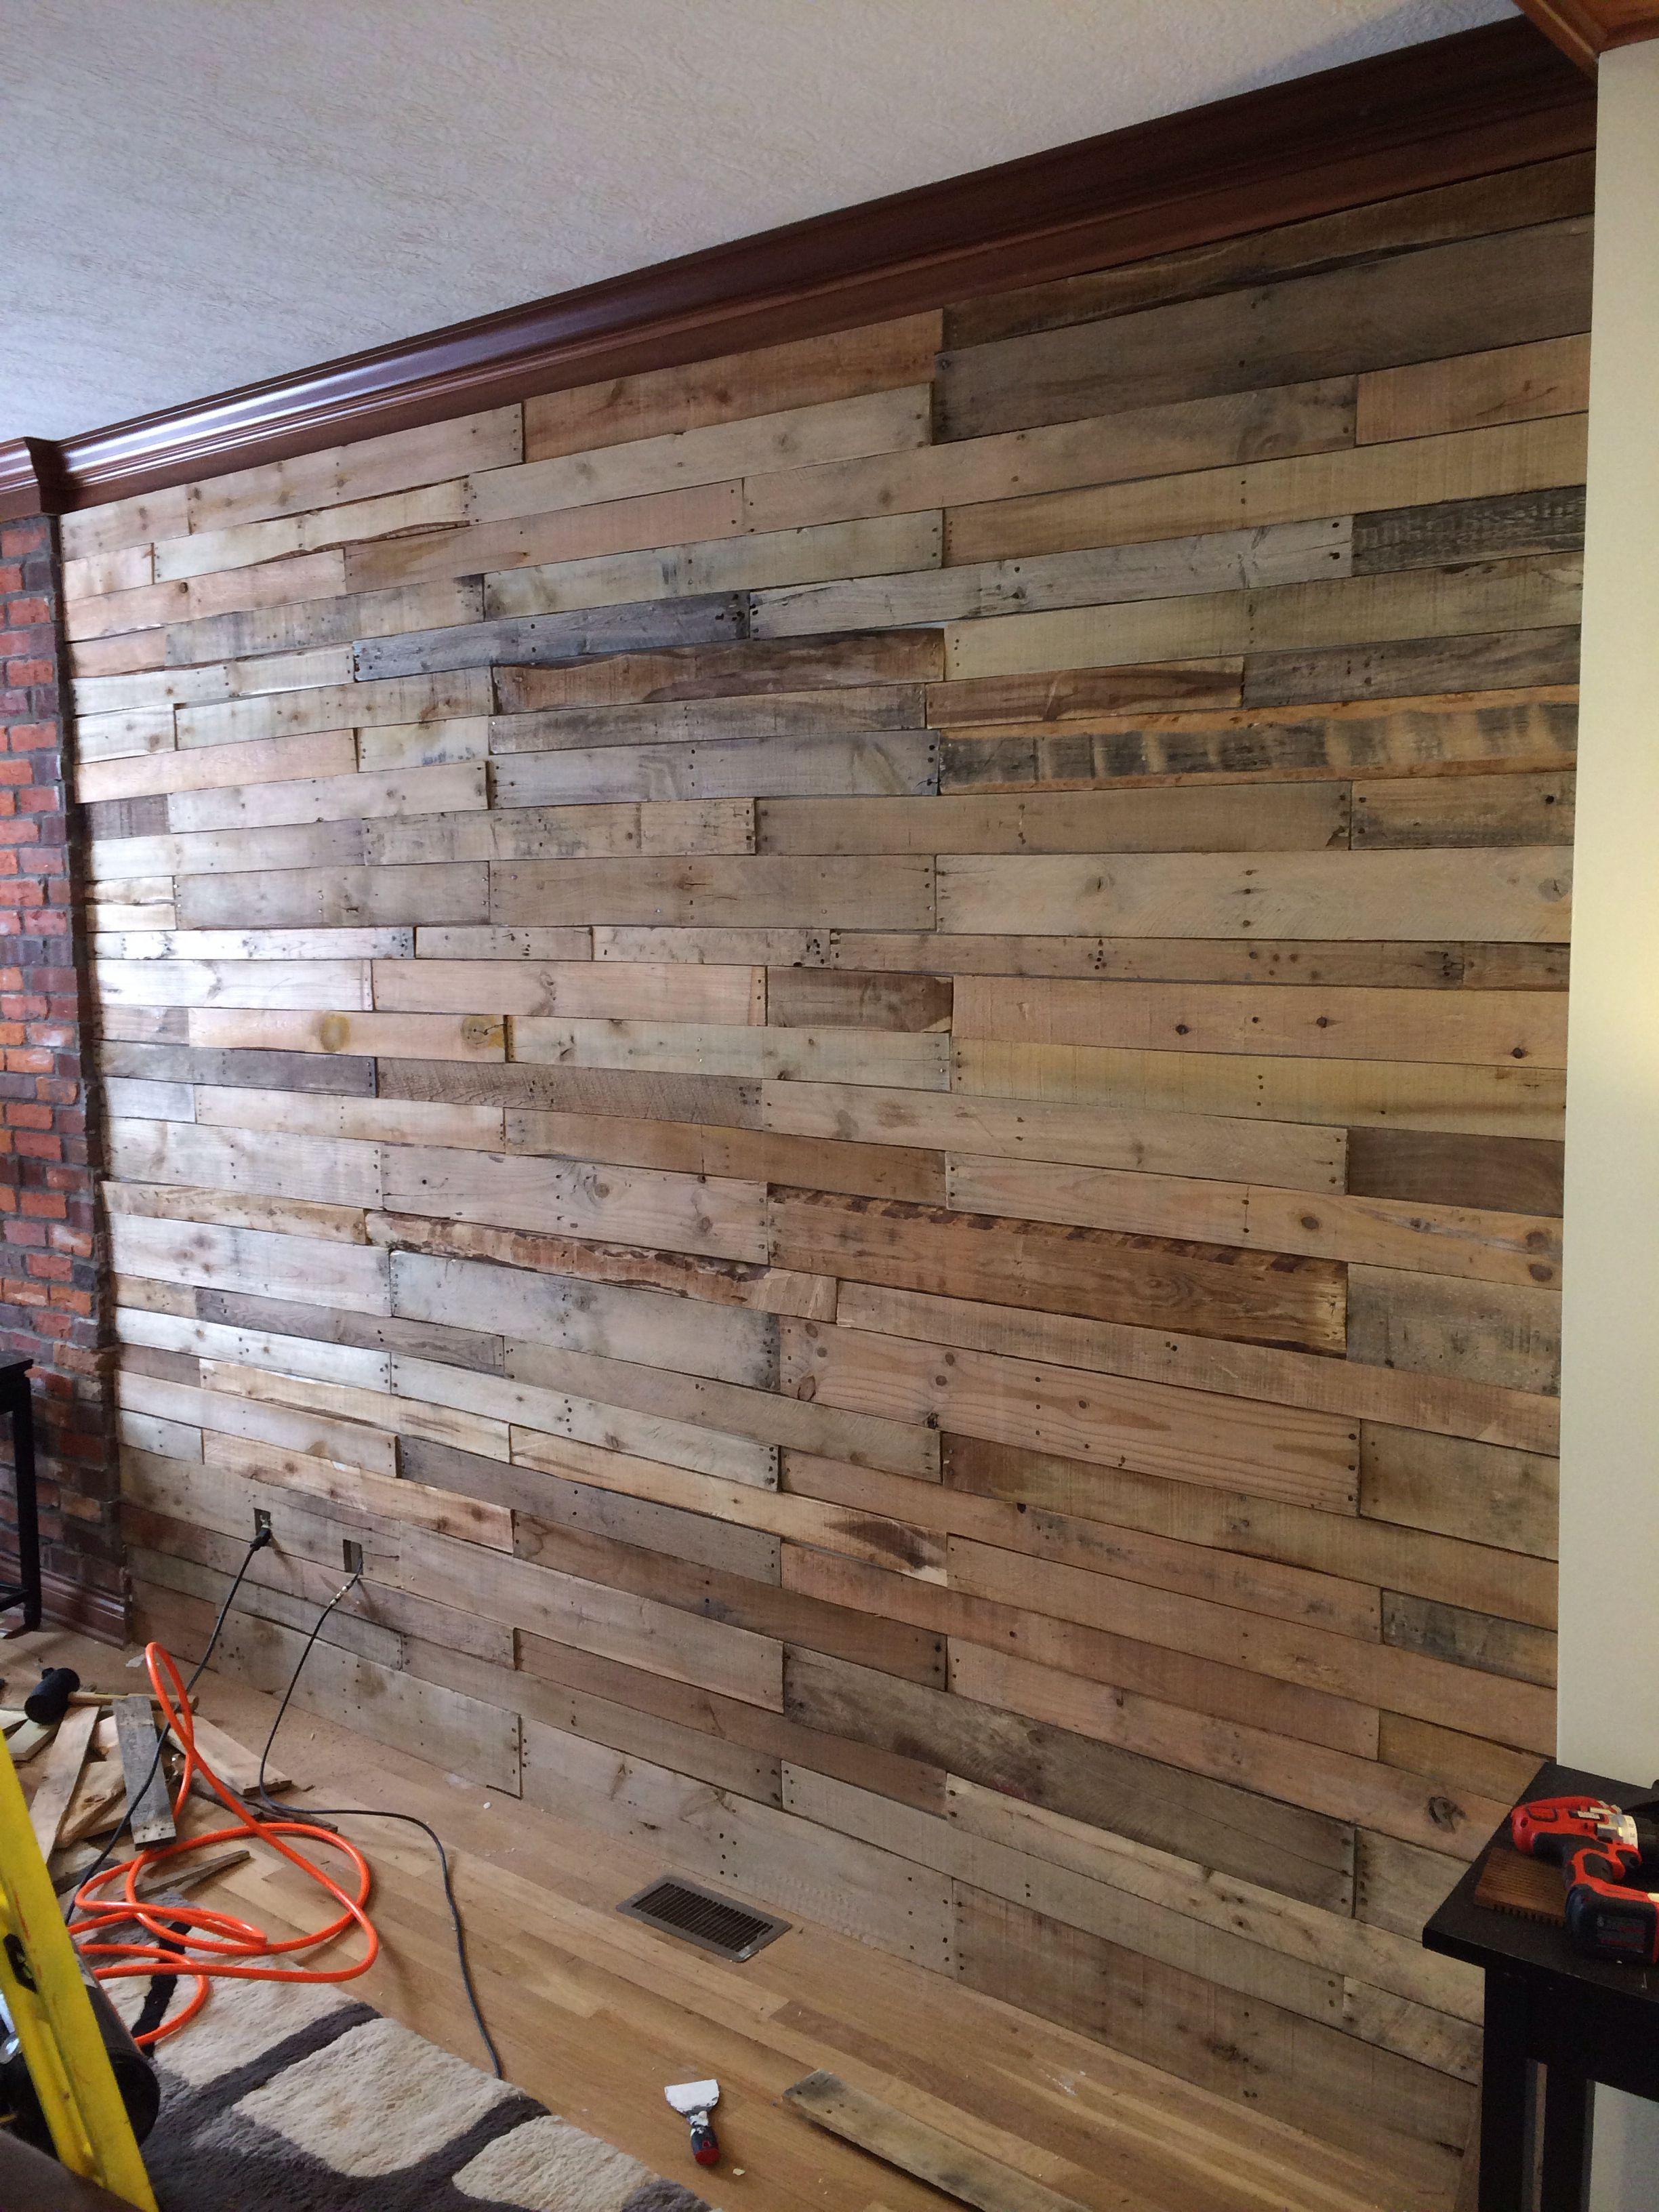 Pallet wood wall | Wood pallet wall, Wood, Pallet walls